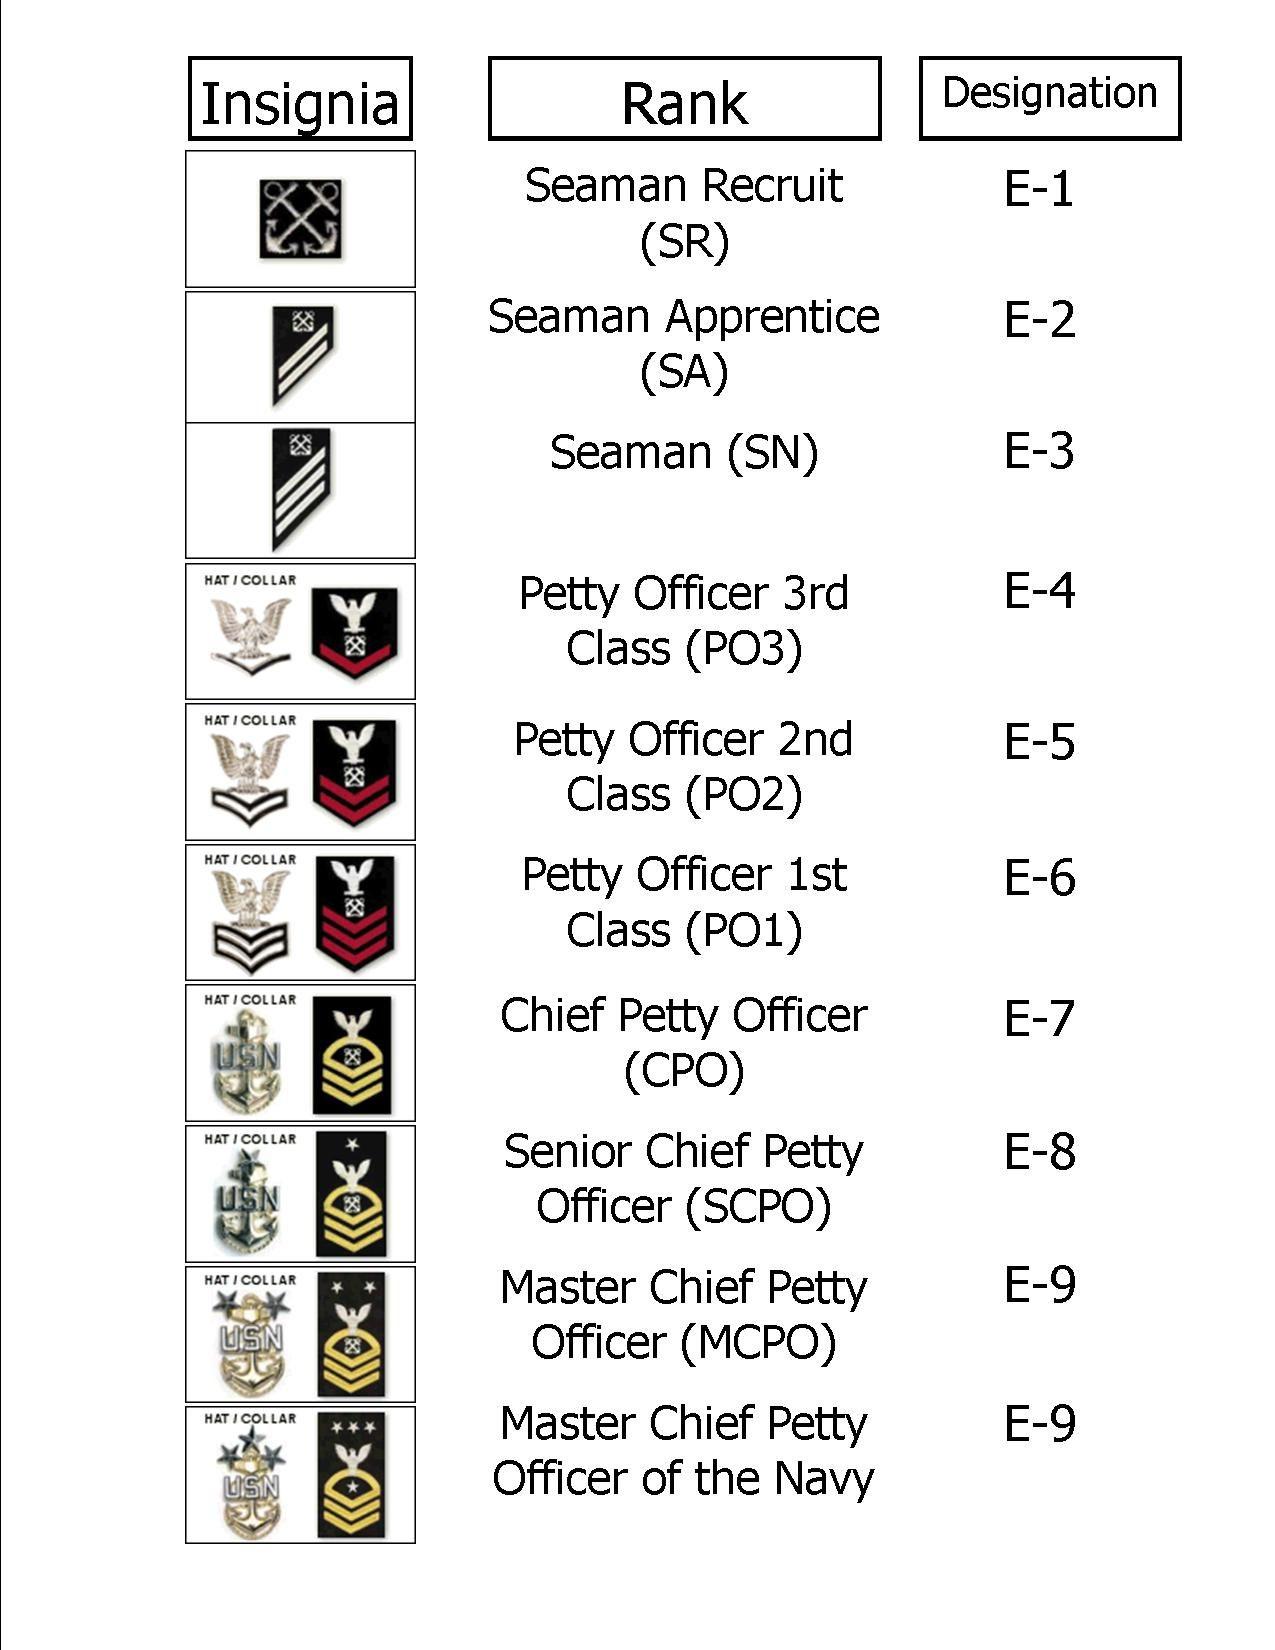 Navy rank chart us navy pinterest navy ranks chart and navy rank chart buycottarizona Image collections